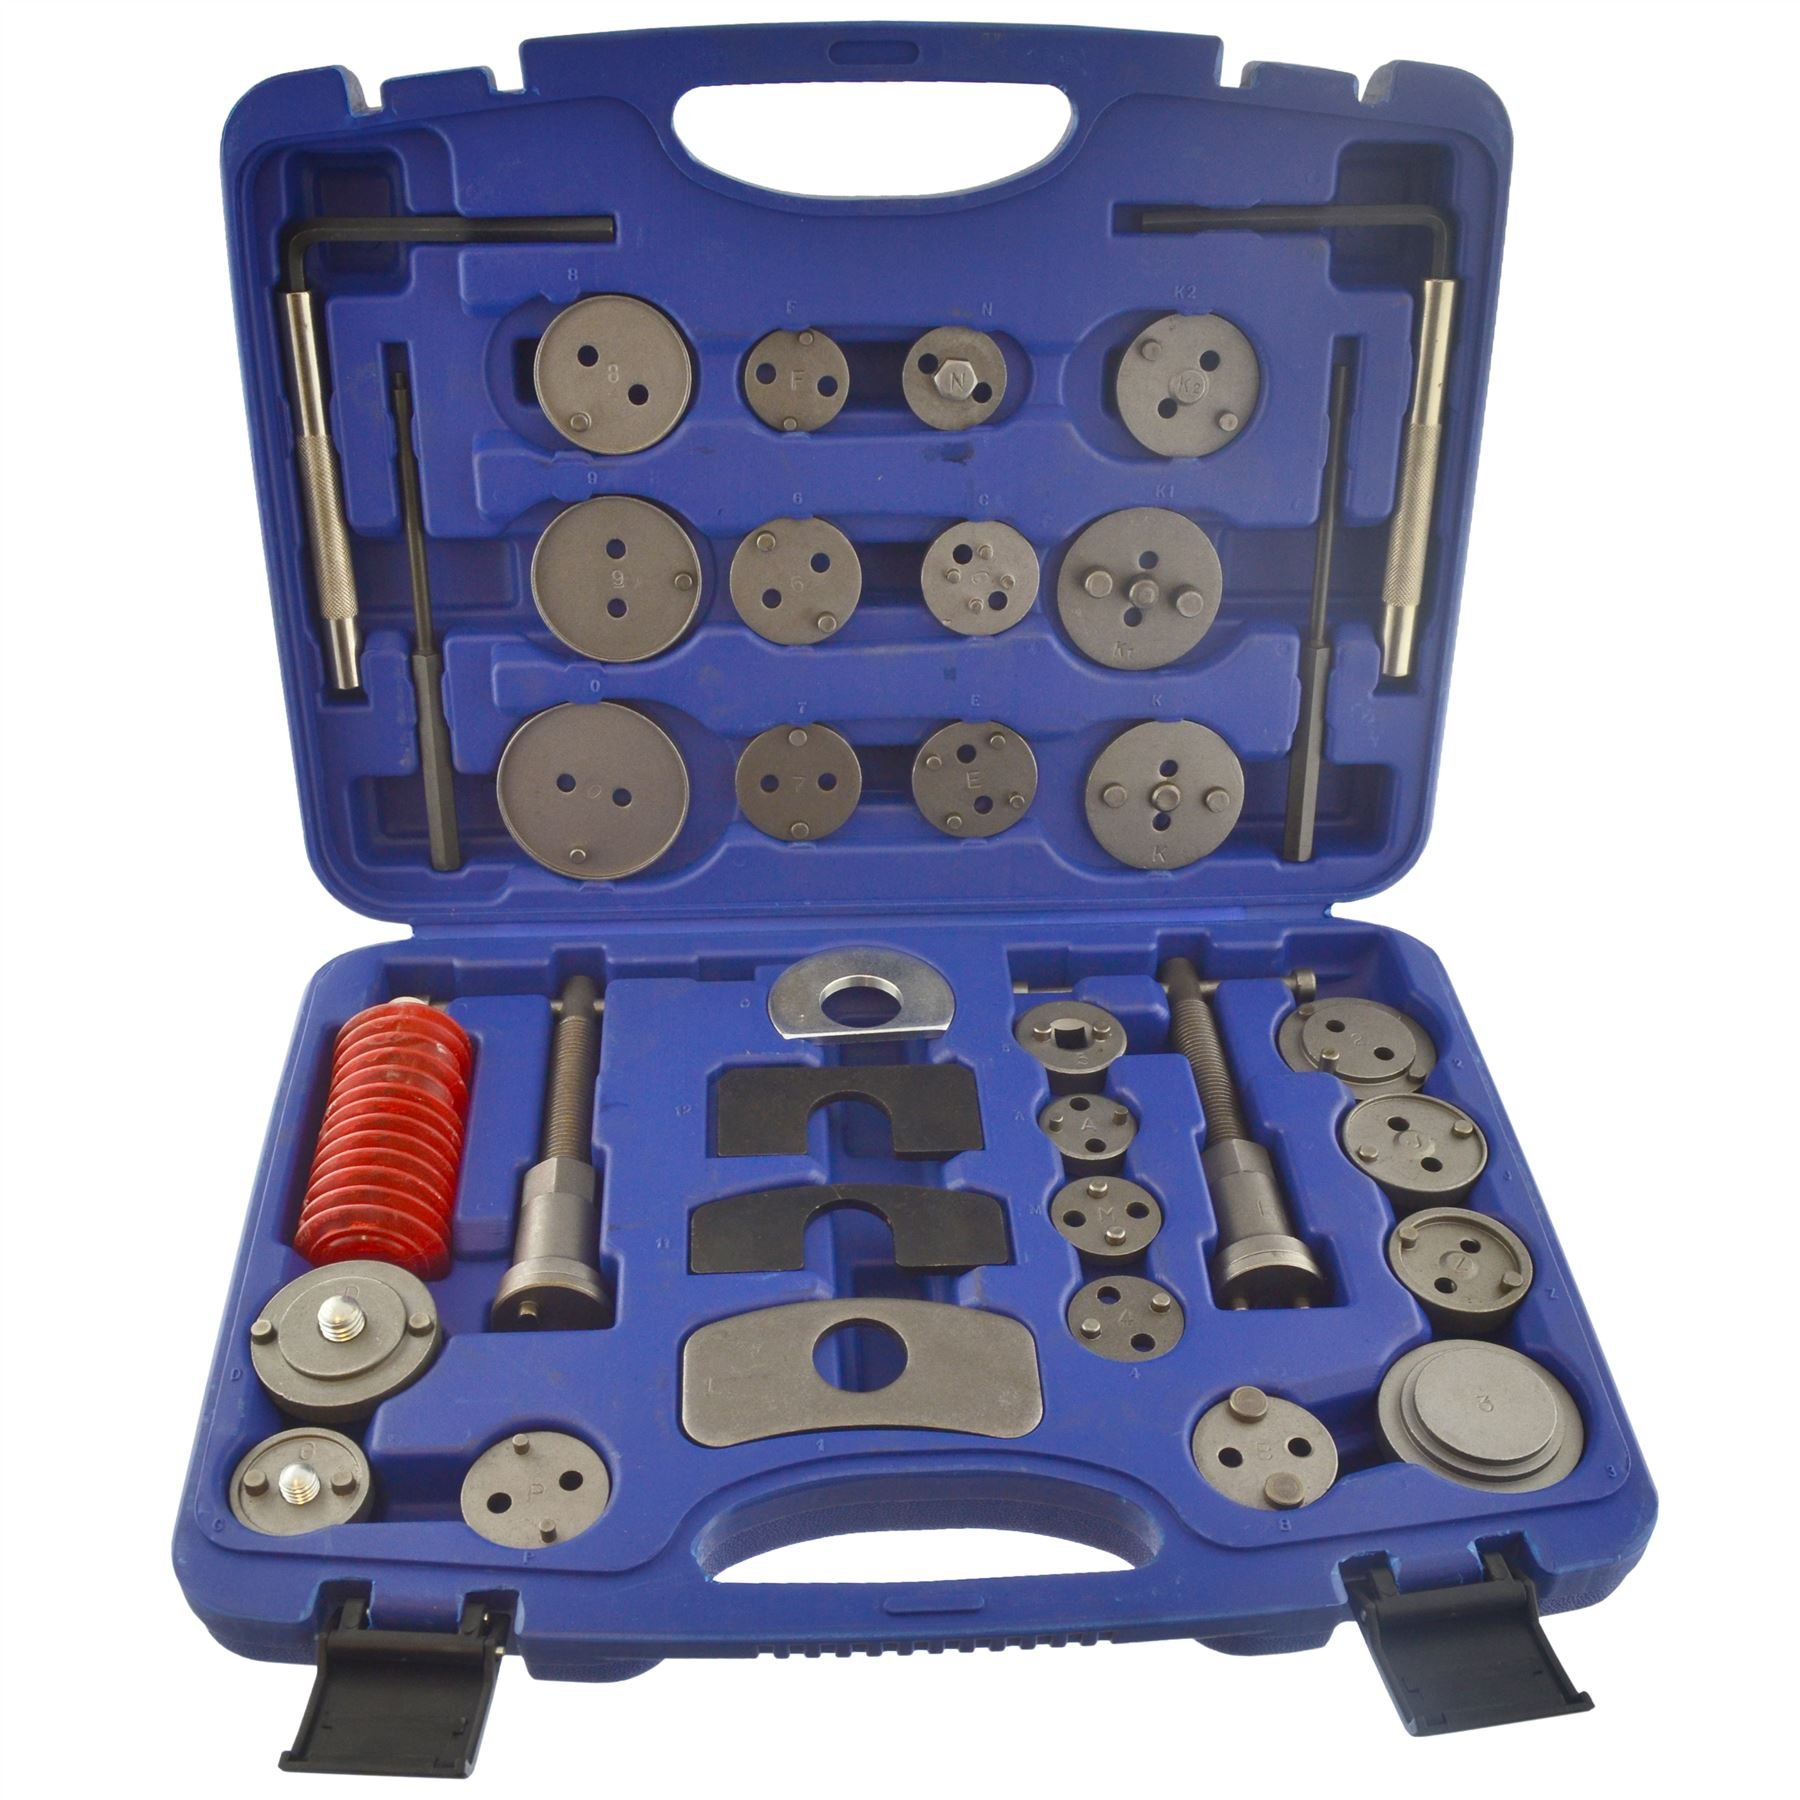 AB Tools-US Pro 35pc Left & Right Hand Brake Calliper/Calliper Wind Back Tool Piston Kit AU003 by AB Tools-US Pro (Image #1)